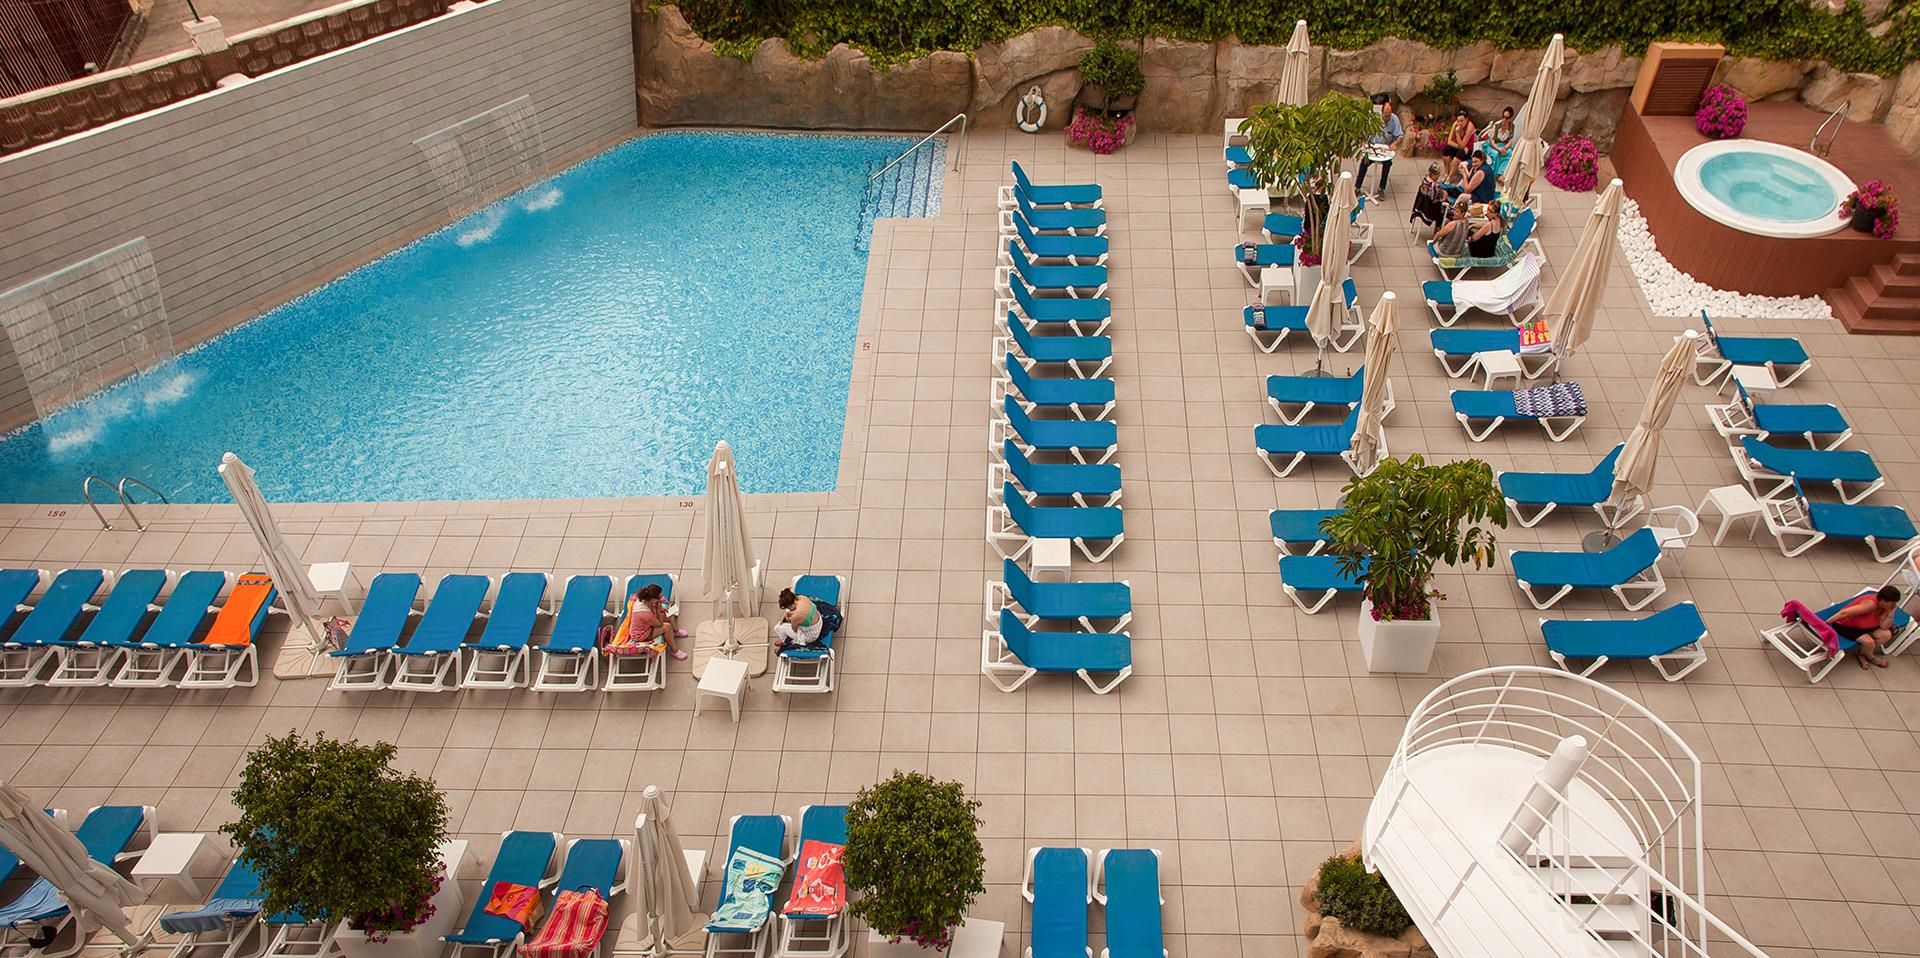 Hotel rh victoria benidorm fotos im genes web oficial for Piscinas vitoria